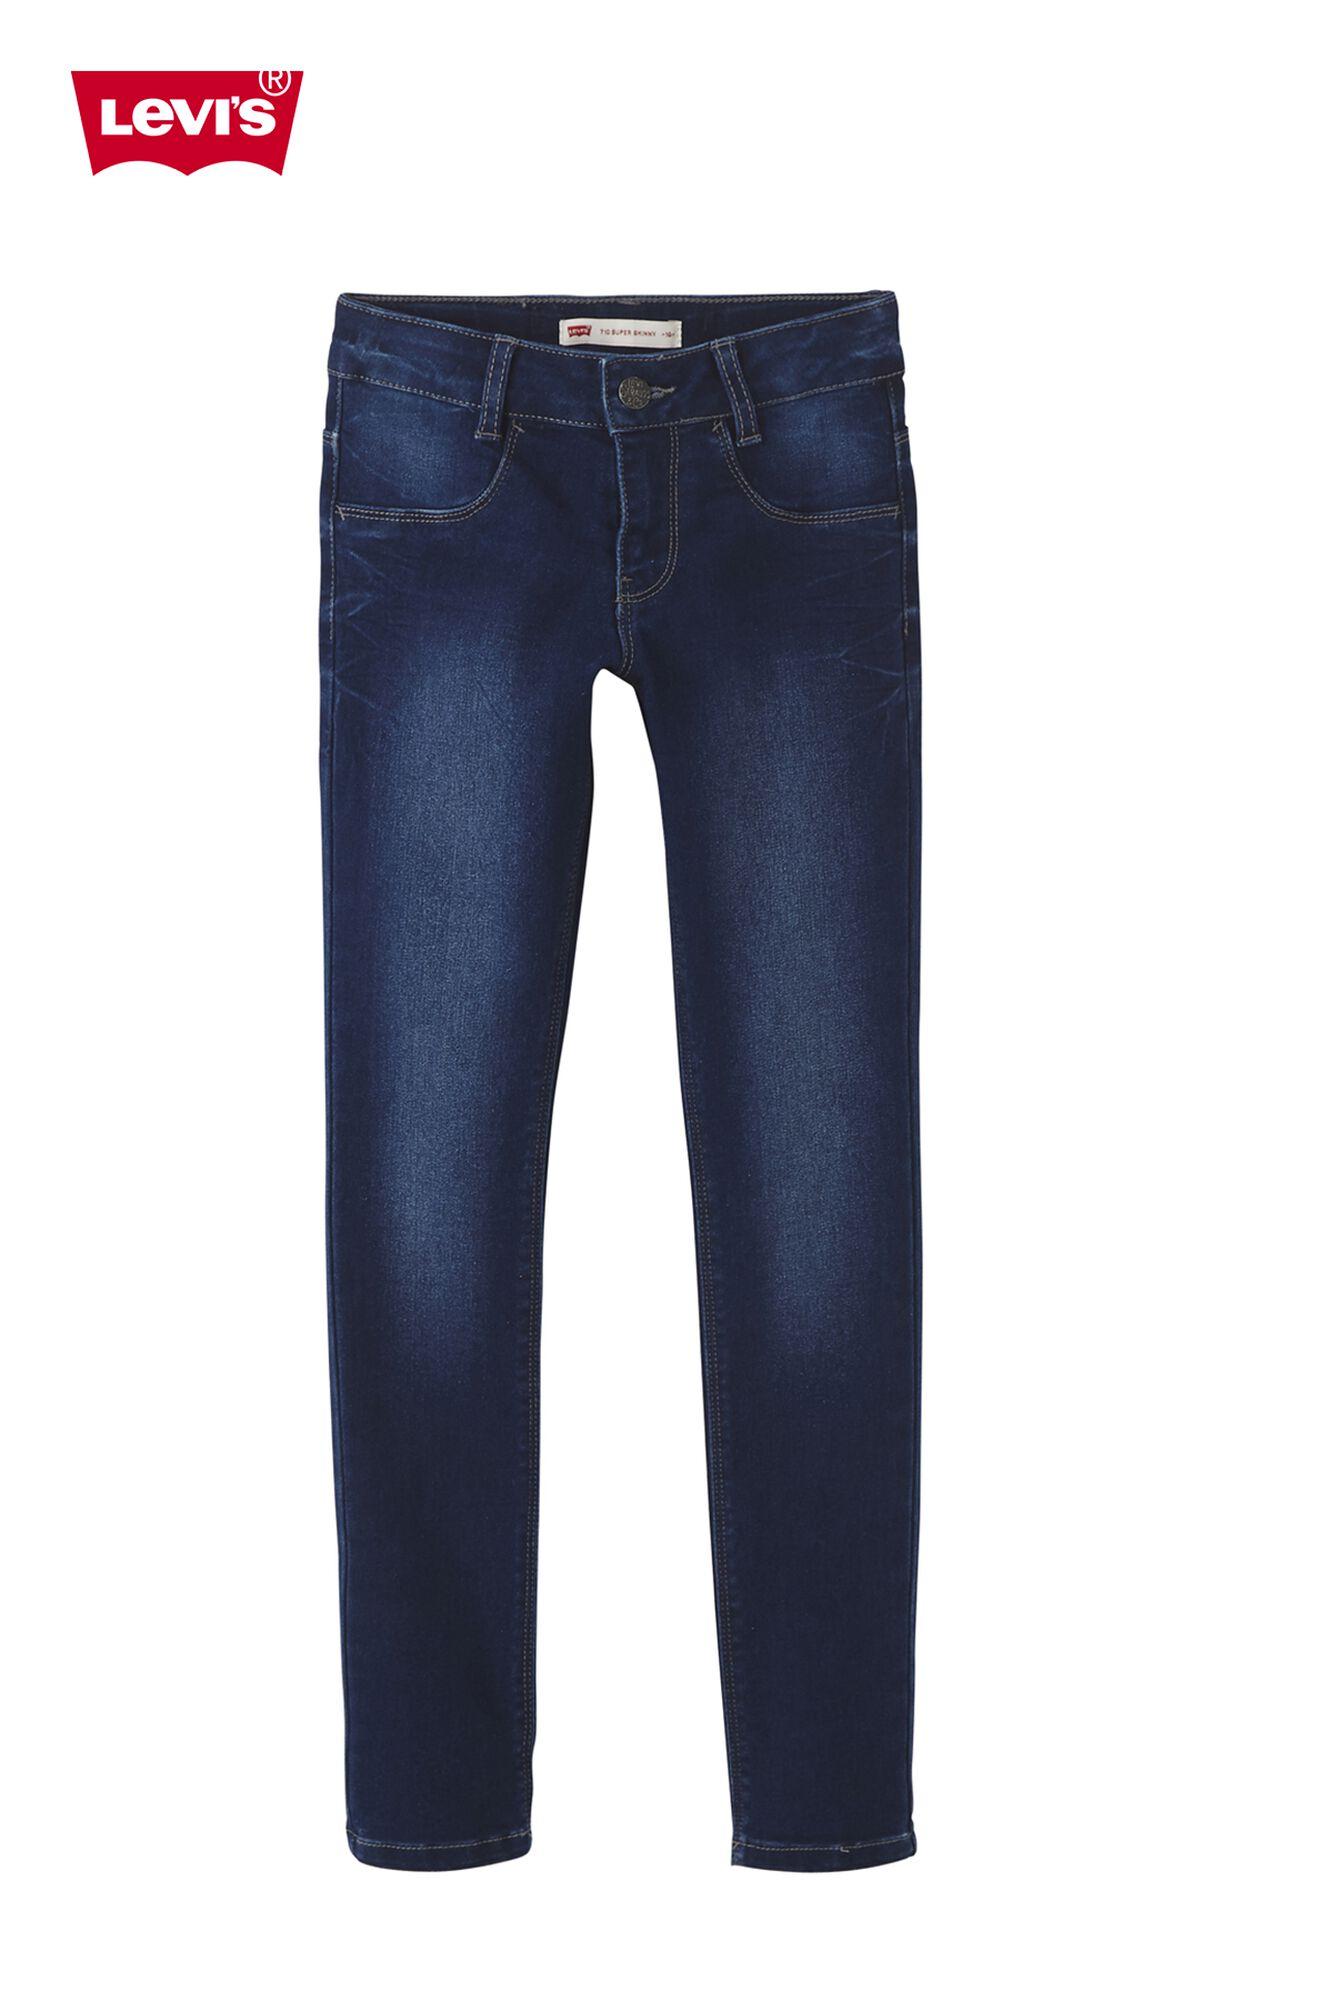 on sale 94ad2 7c42d Jeans Levi's 710 Super skinny